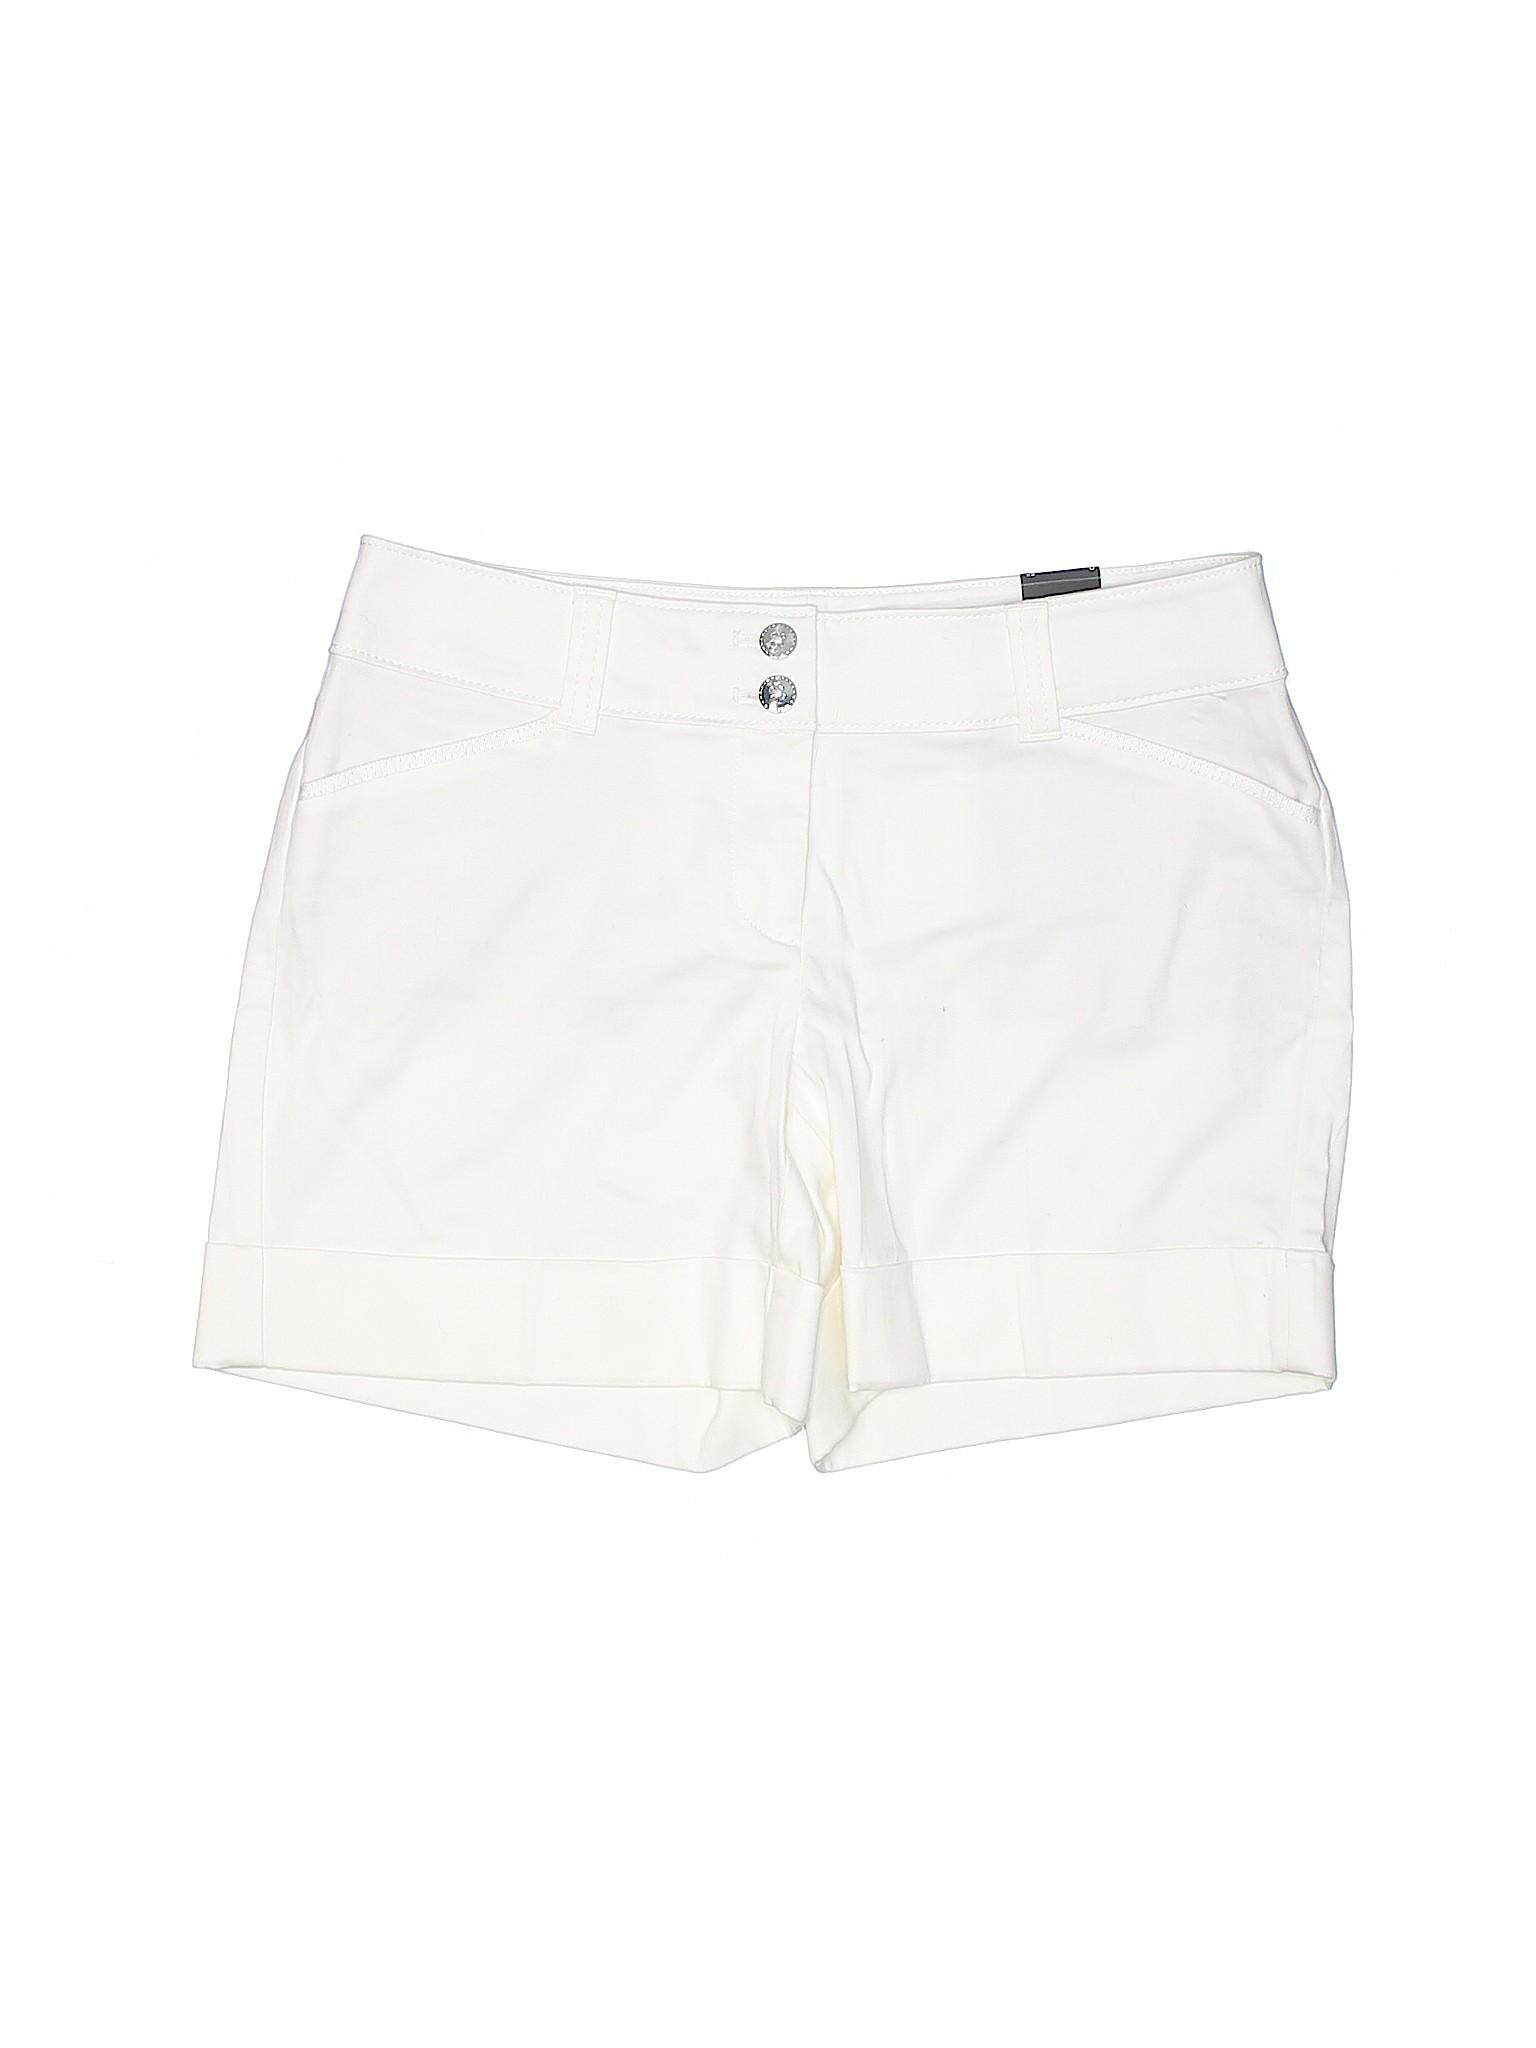 House Shorts Black Khaki Boutique White Market qPnwTXA5